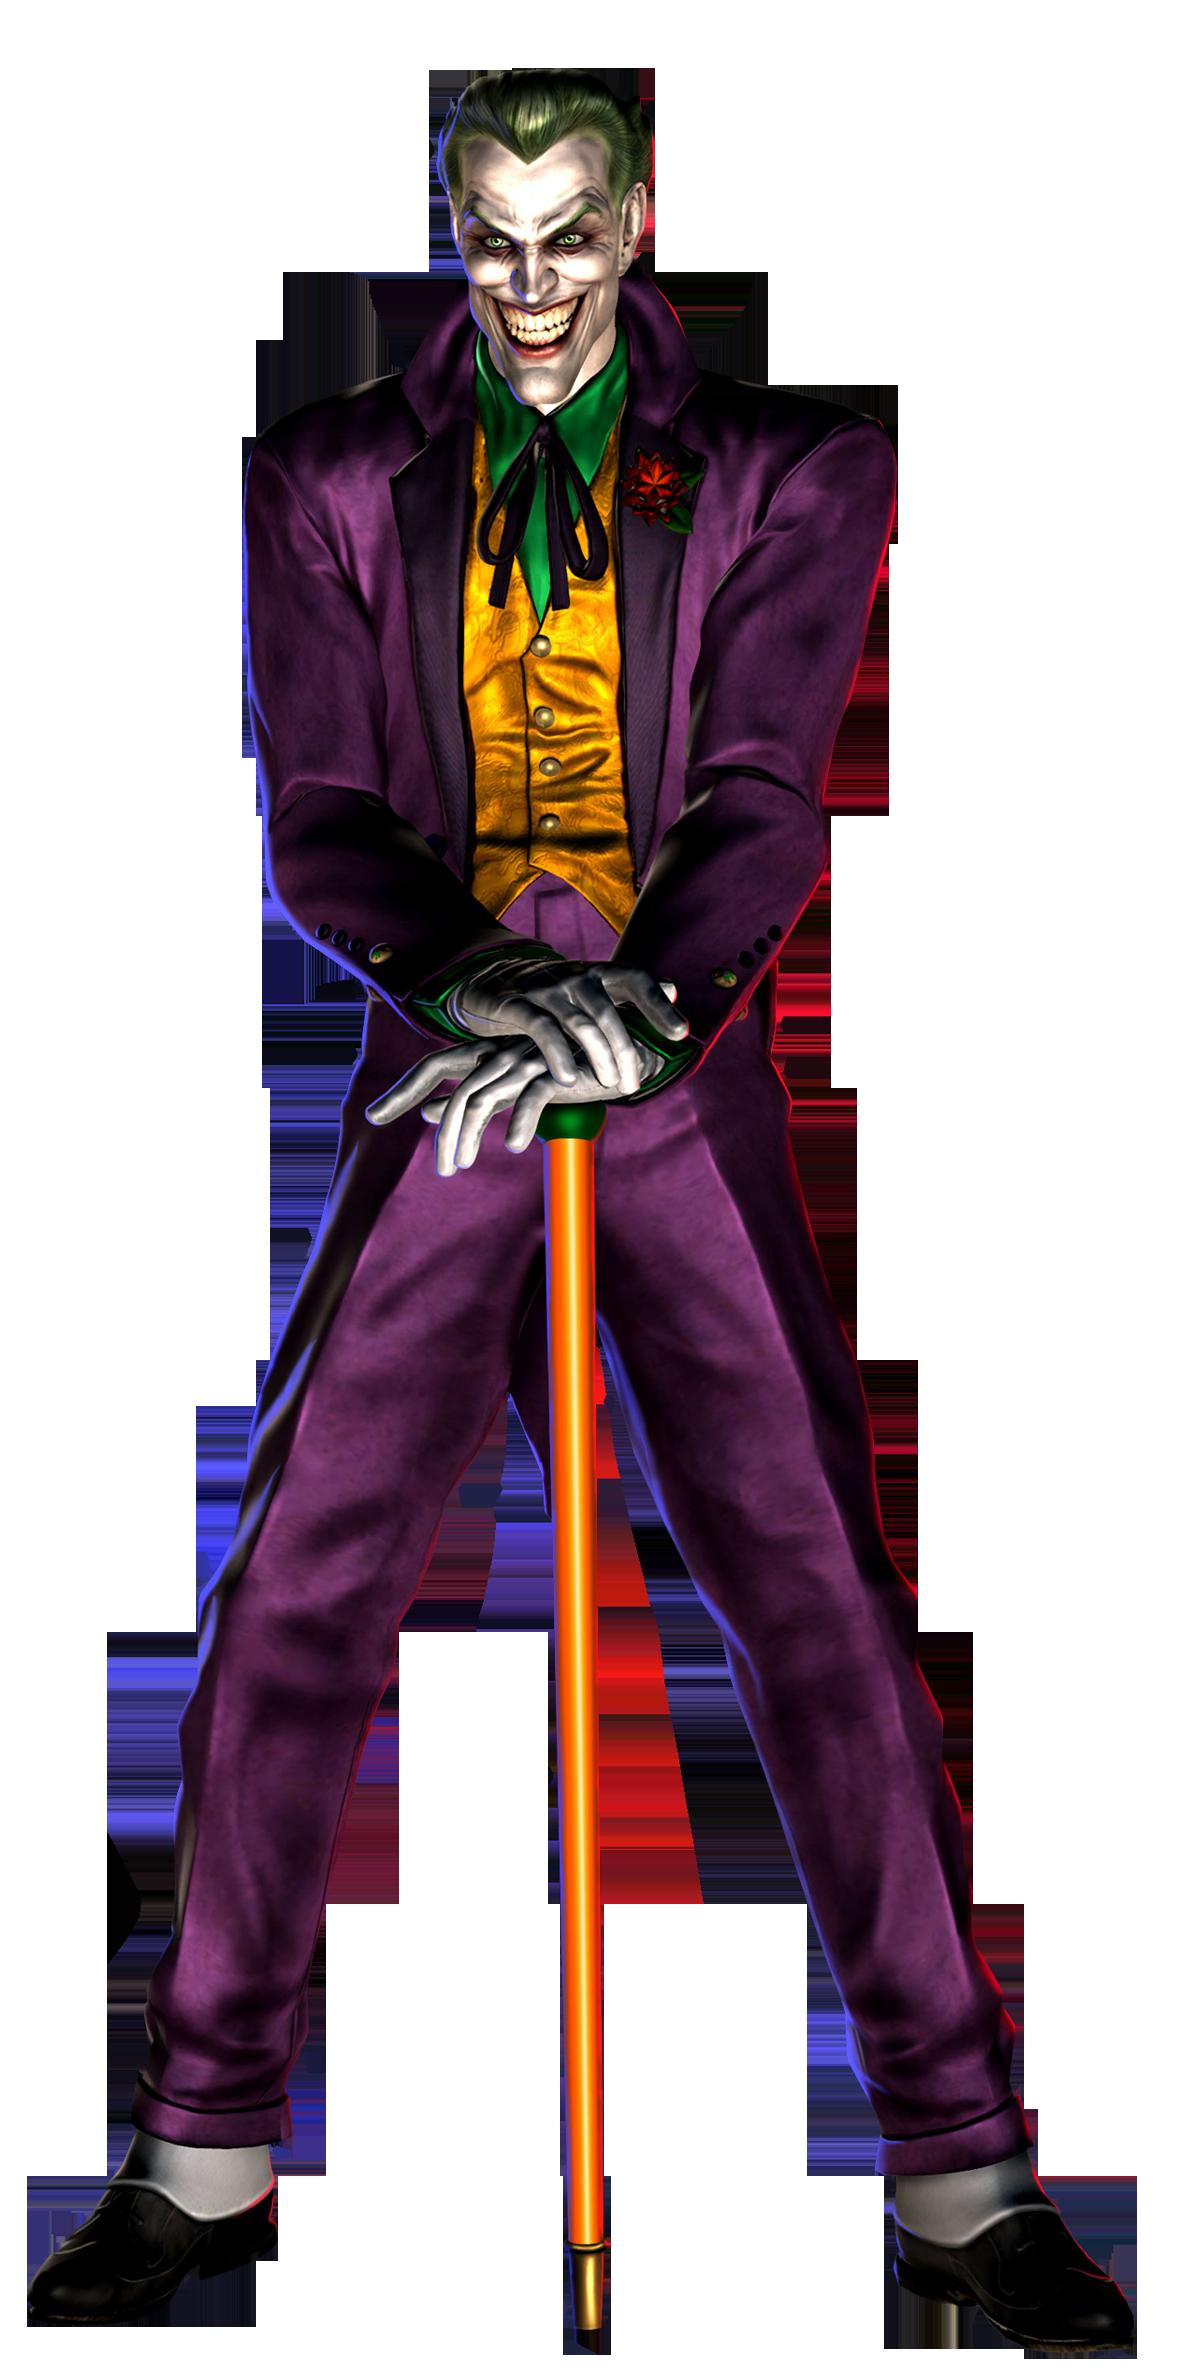 Joker PNG images free download.